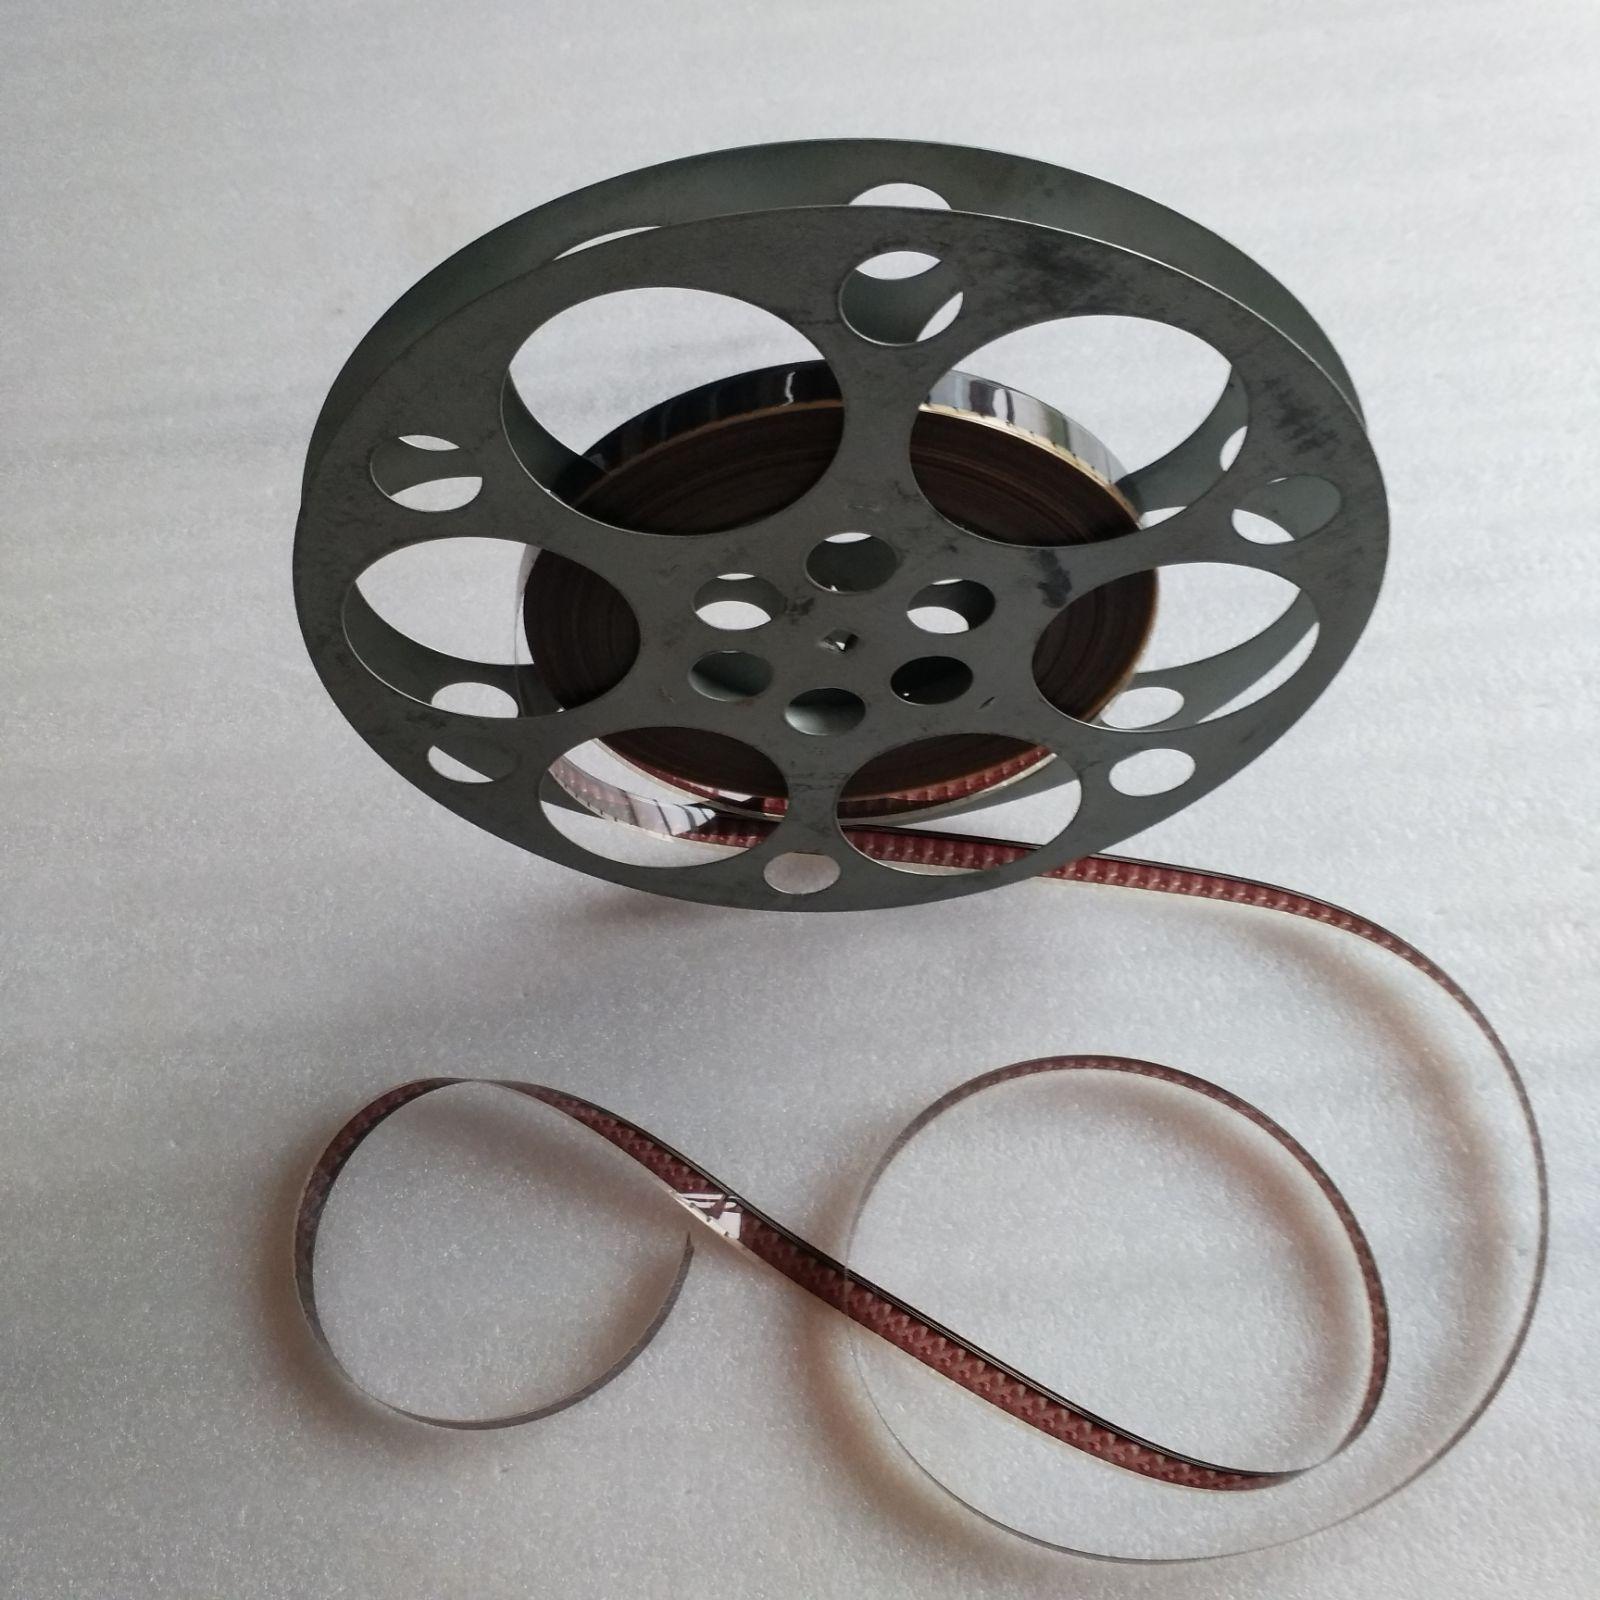 16 mm movie negative movie copy movie projector film clip disc film prop decoration